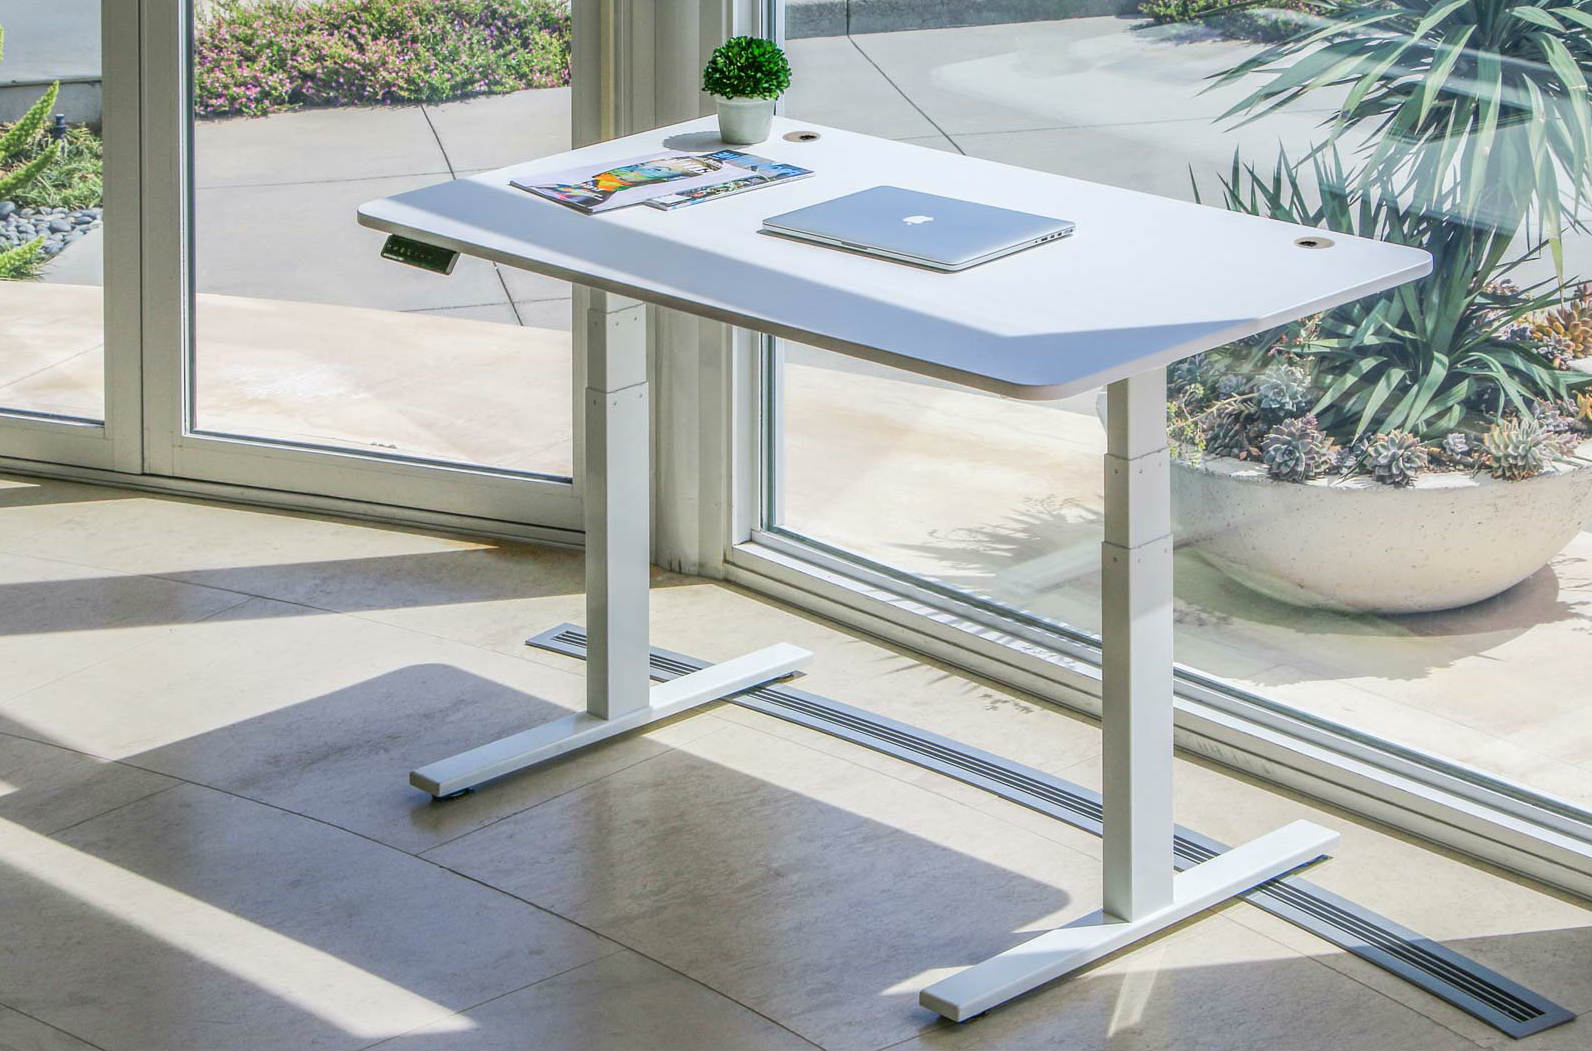 Autonomous SmartDesk_2 sit-to-stand ergonomic table image